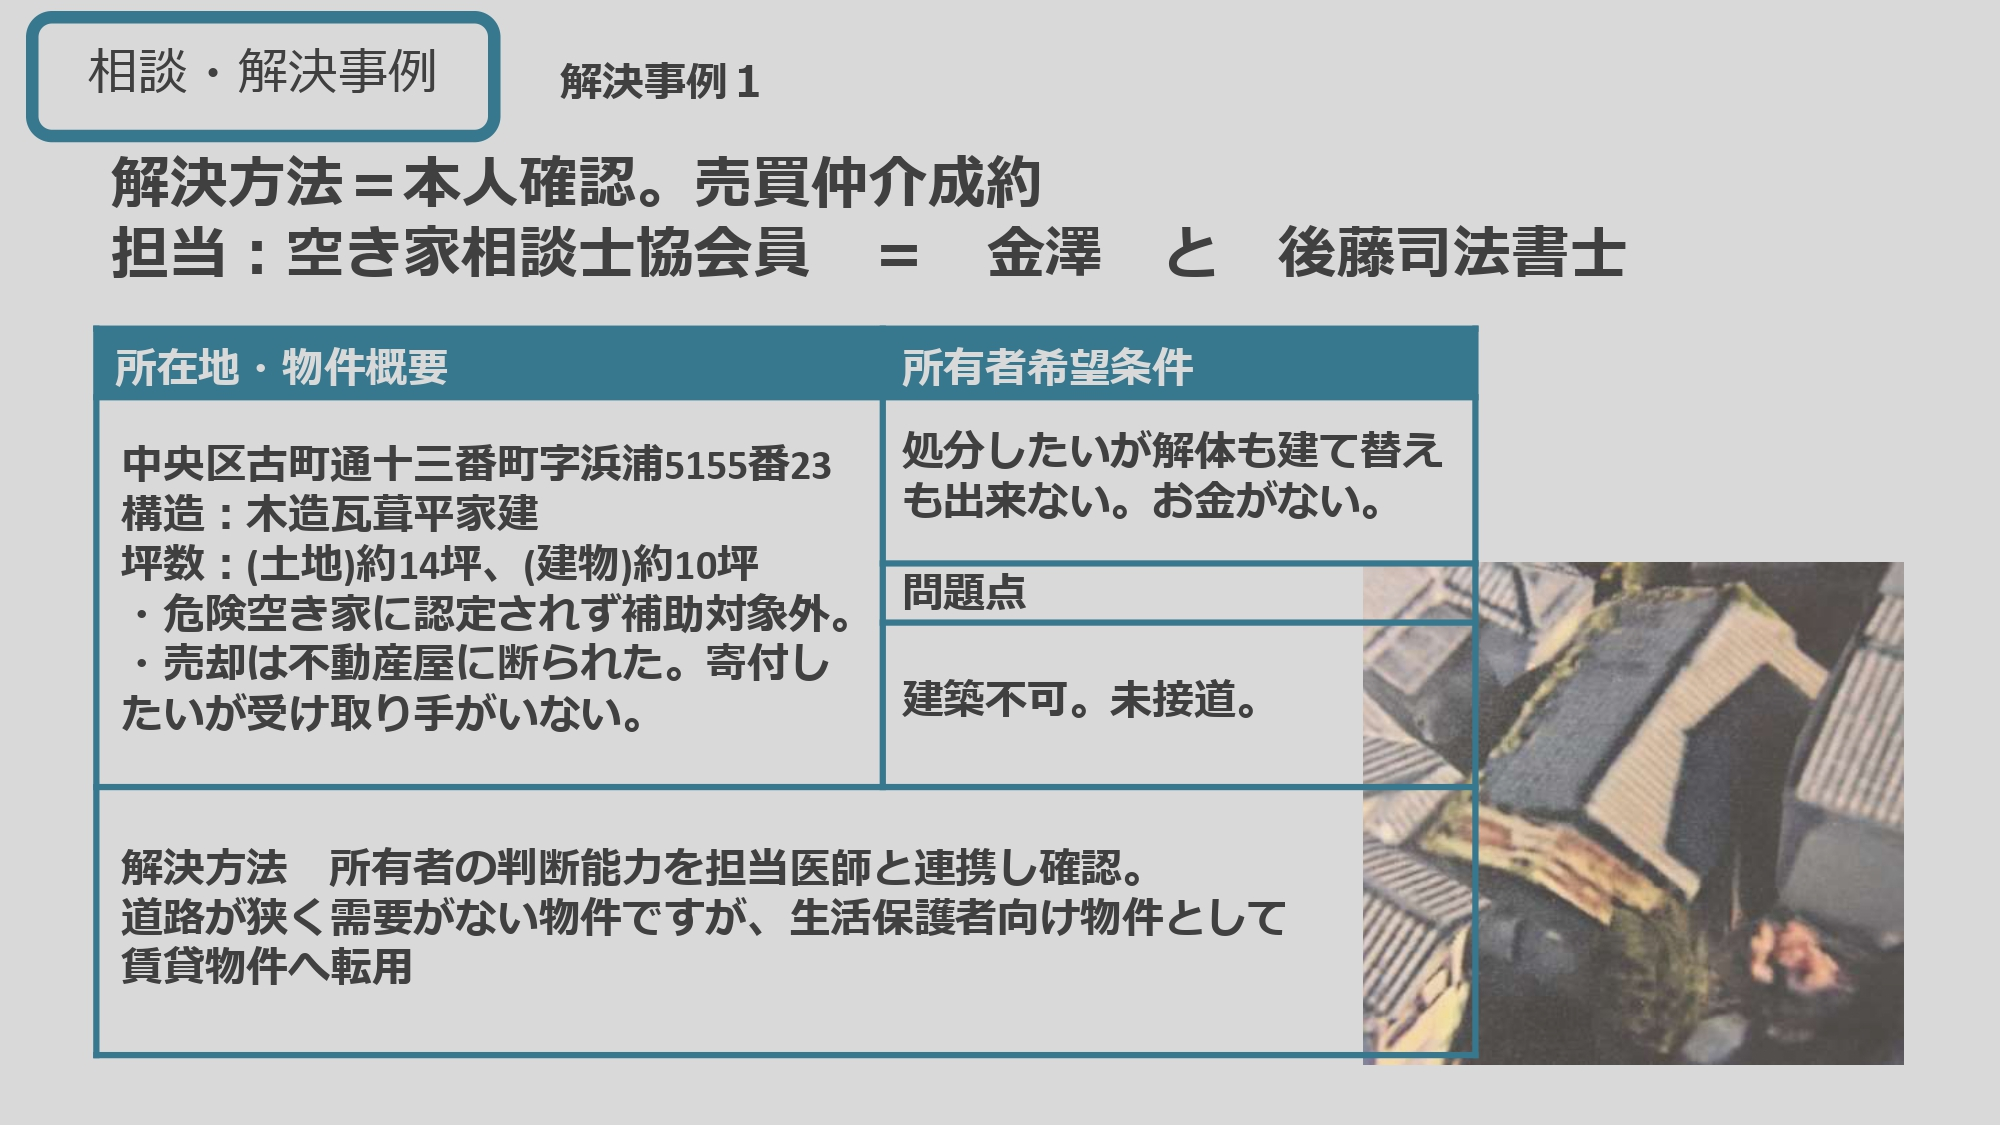 新潟大学_pages-to-jpg-0028